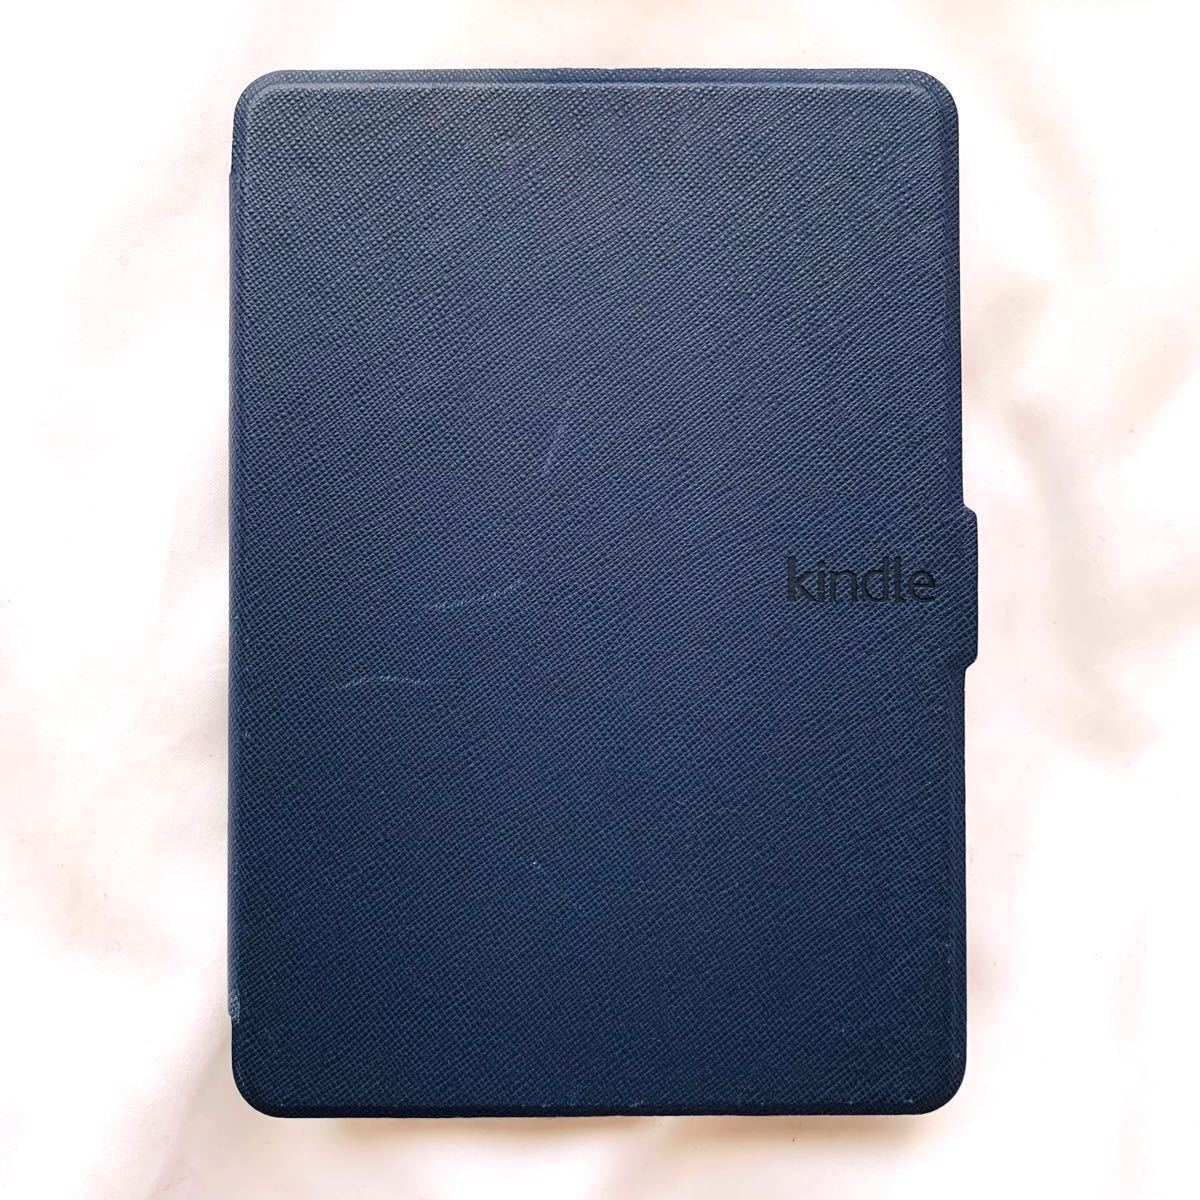 Kindle Paperwhite マンガモデル 第7世代 広告なし 電子書籍リーダー Wi-Fi 32GB カバー付き